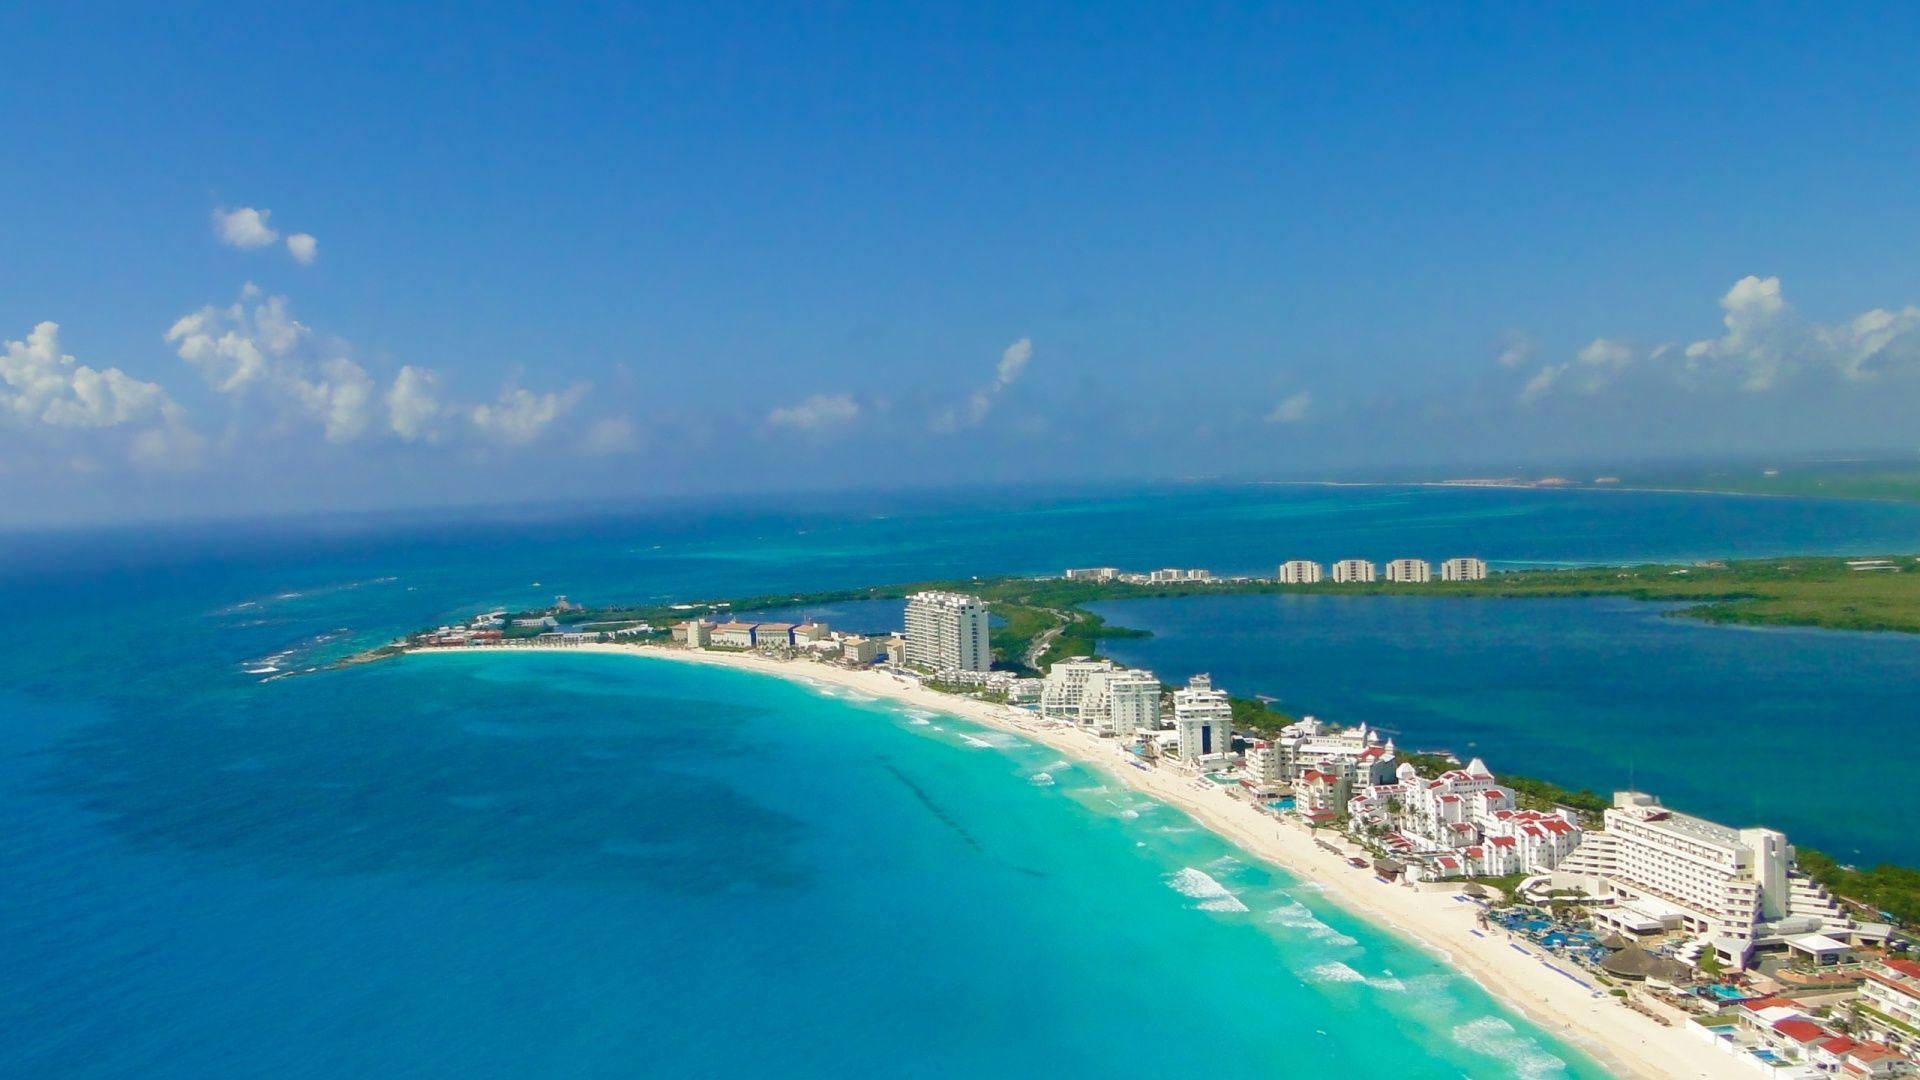 Cancun Wallpapers Top Free Cancun Backgrounds Wallpaperaccess